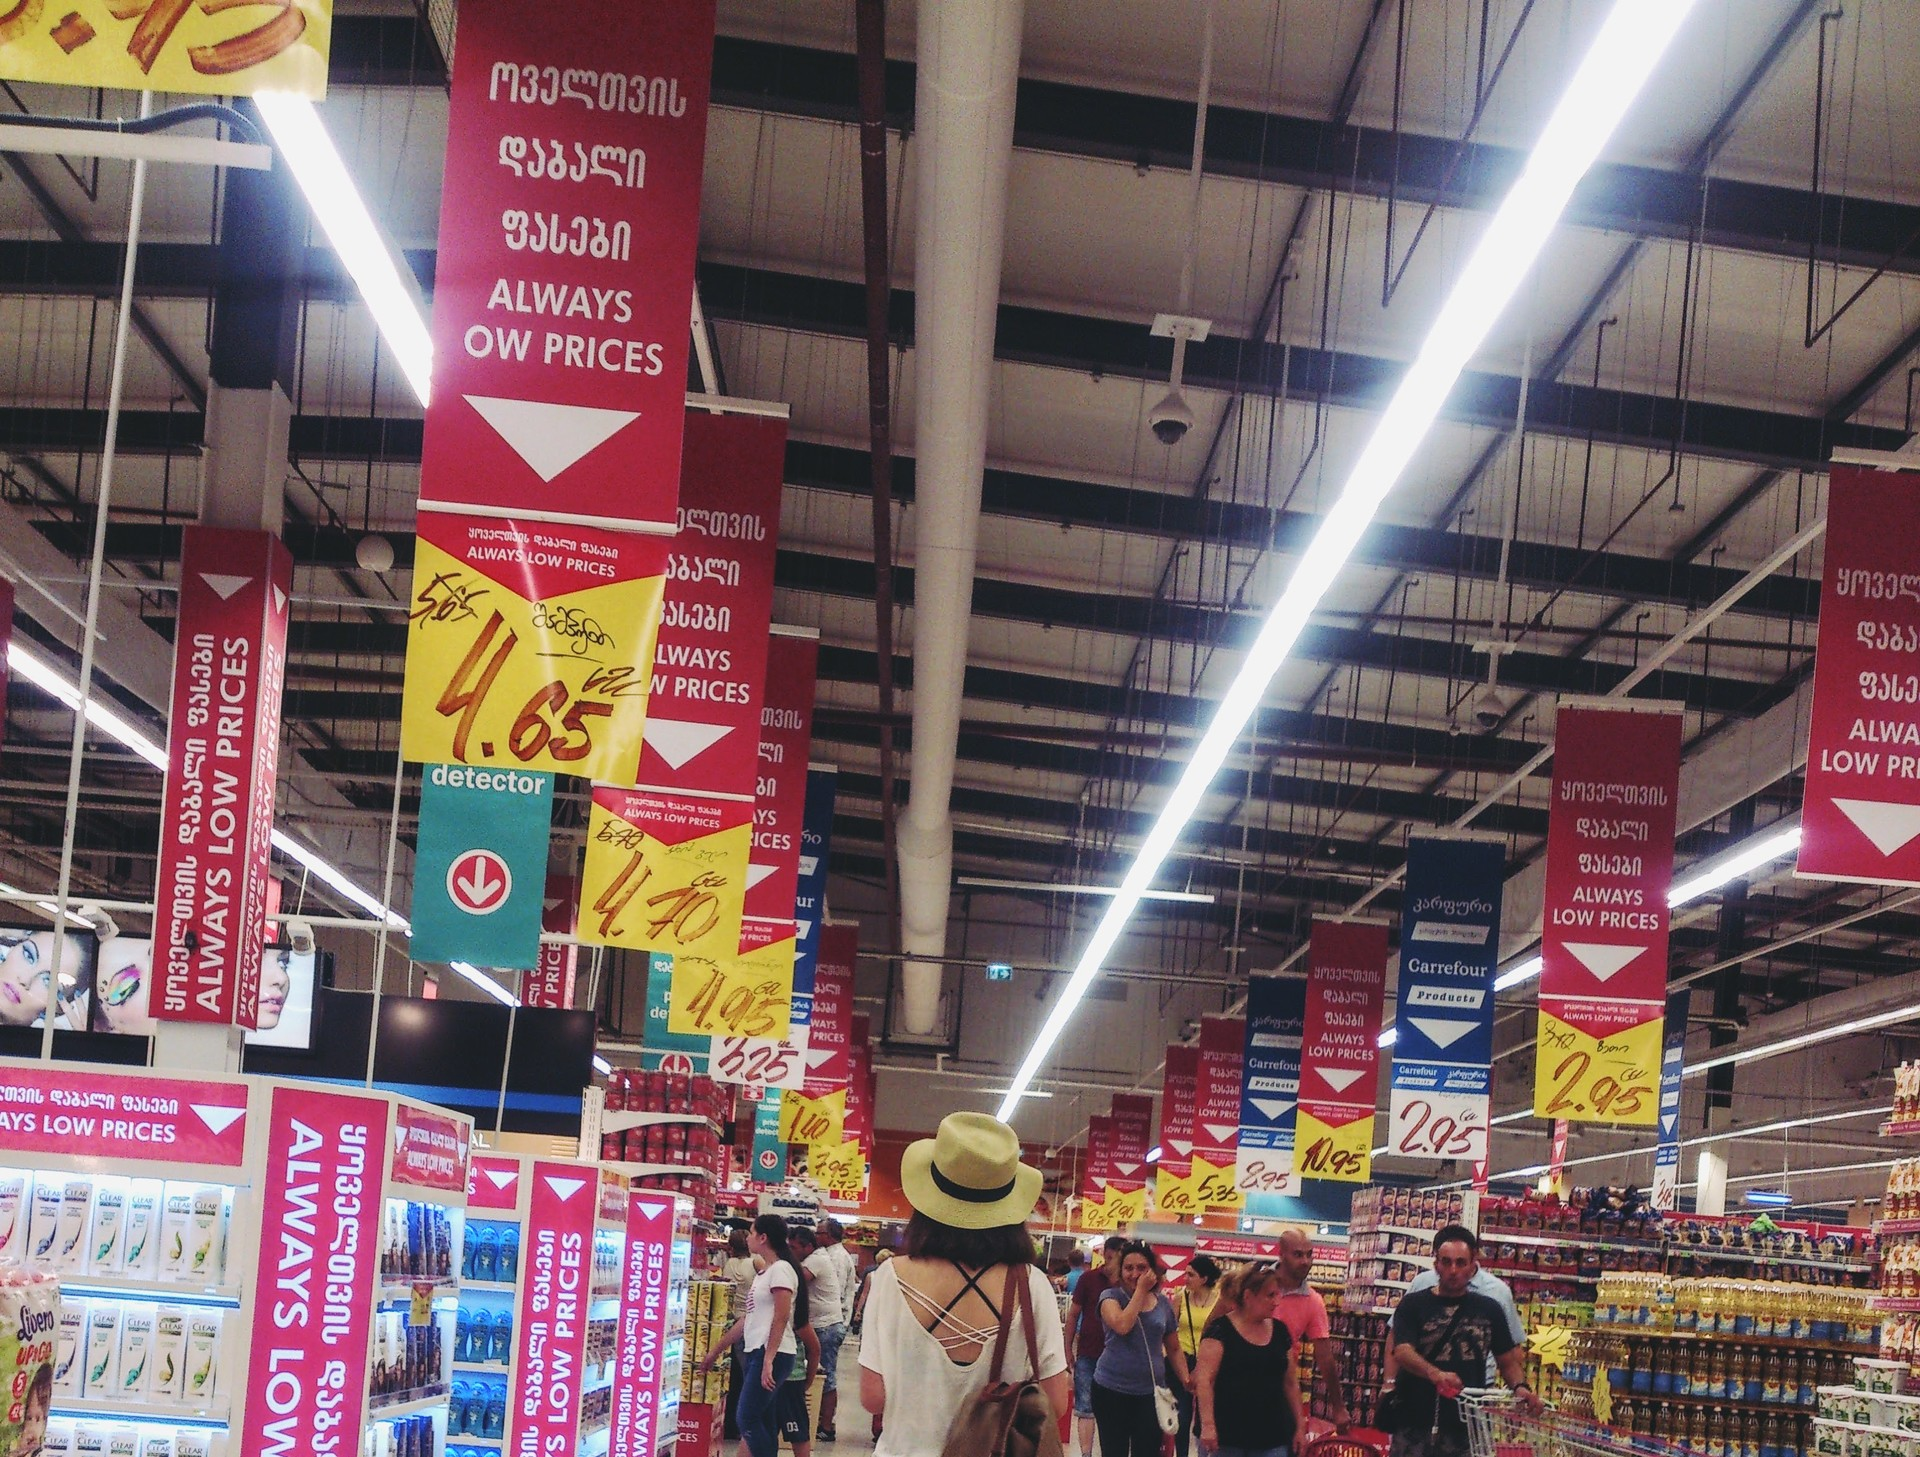 Esperienza di shopping a Tbilisi